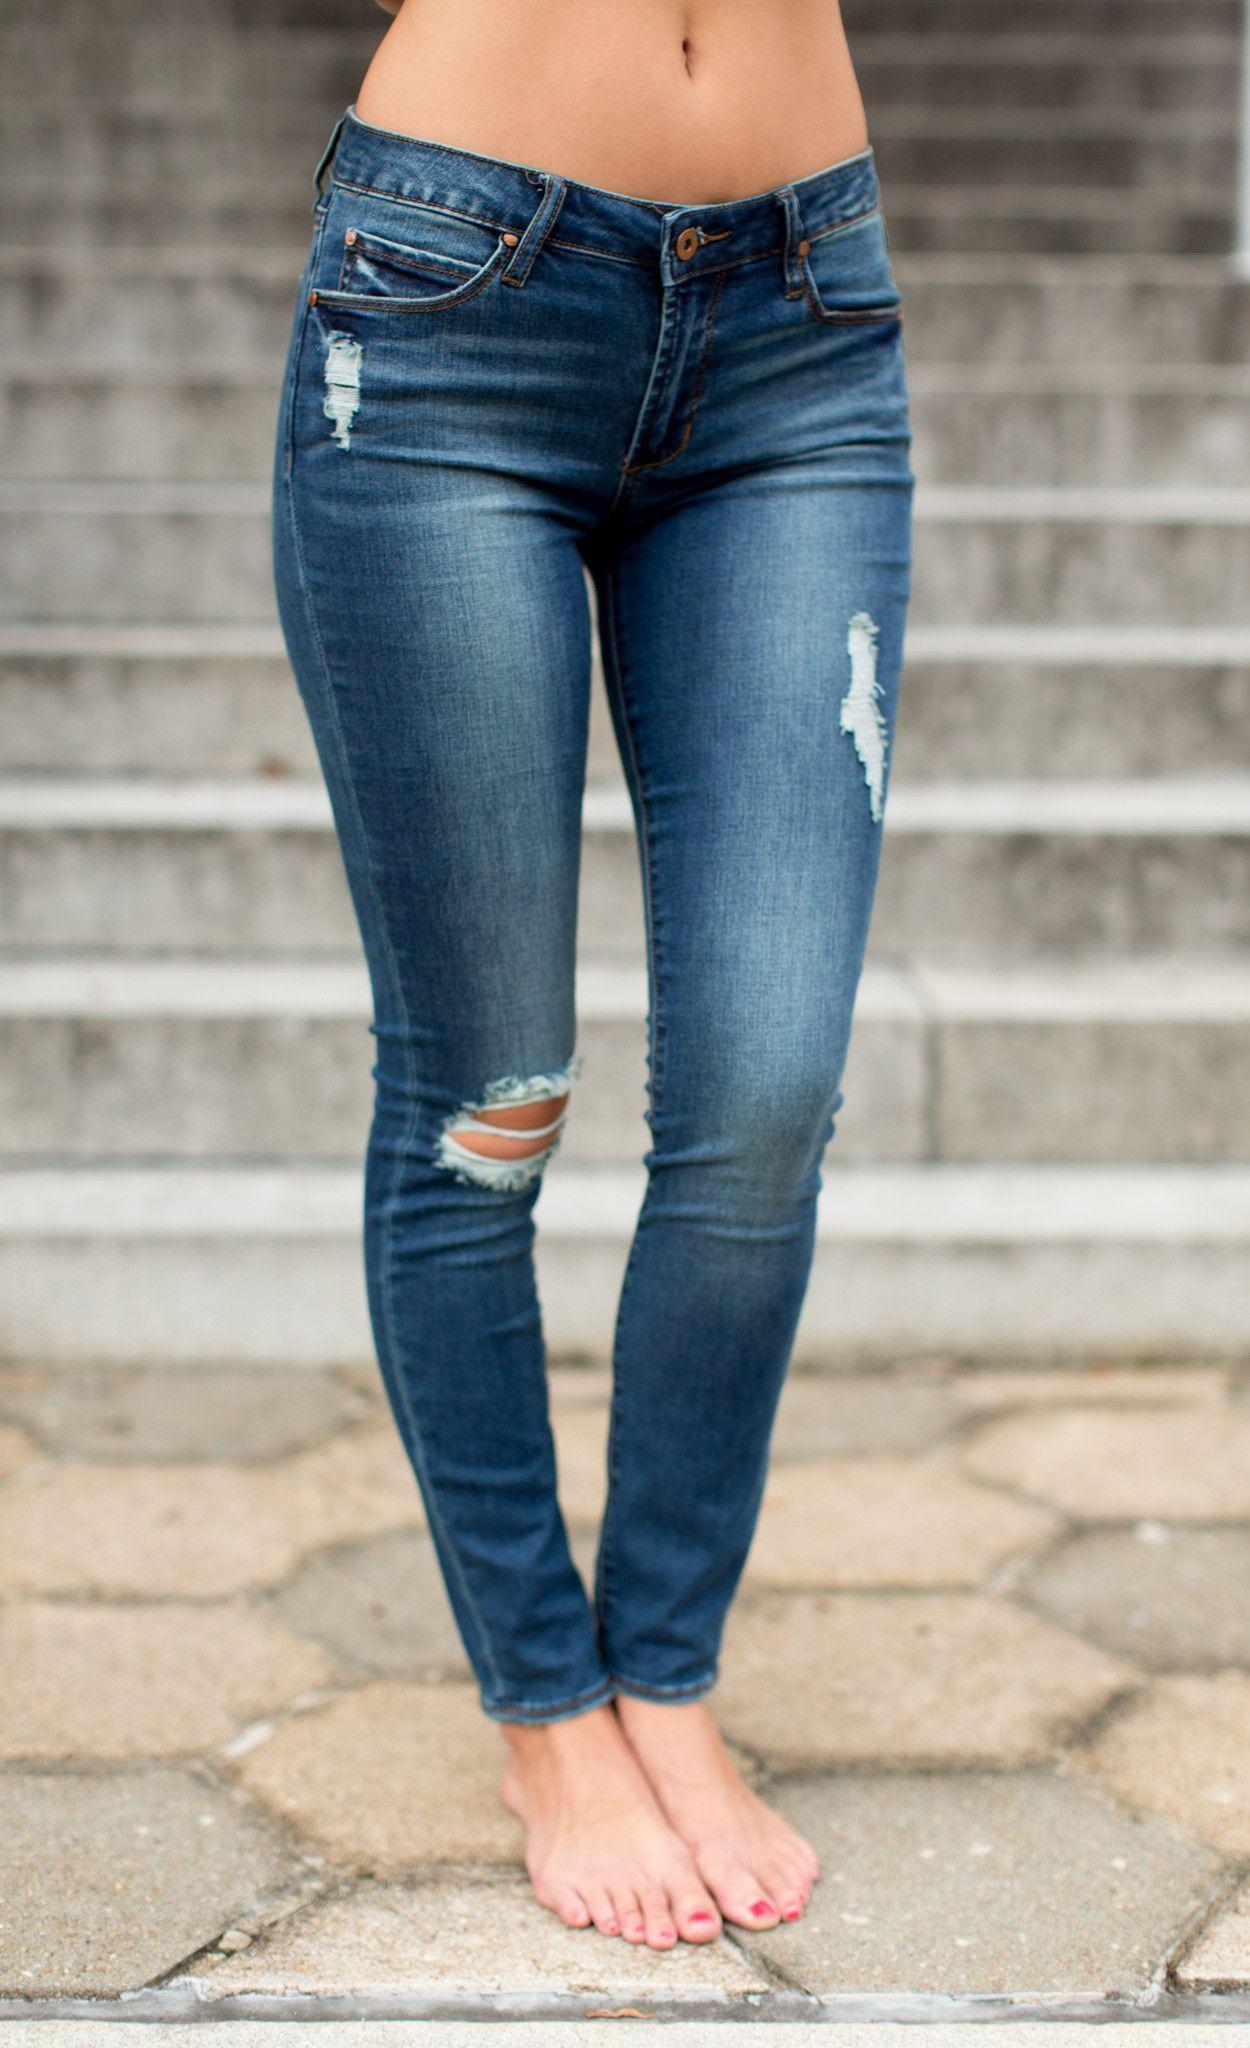 f02ed2e0d2 Articles of Society Sarah Skinny Jeans - Hollywood. Got them yesterday at  SOHO! thanks guys!